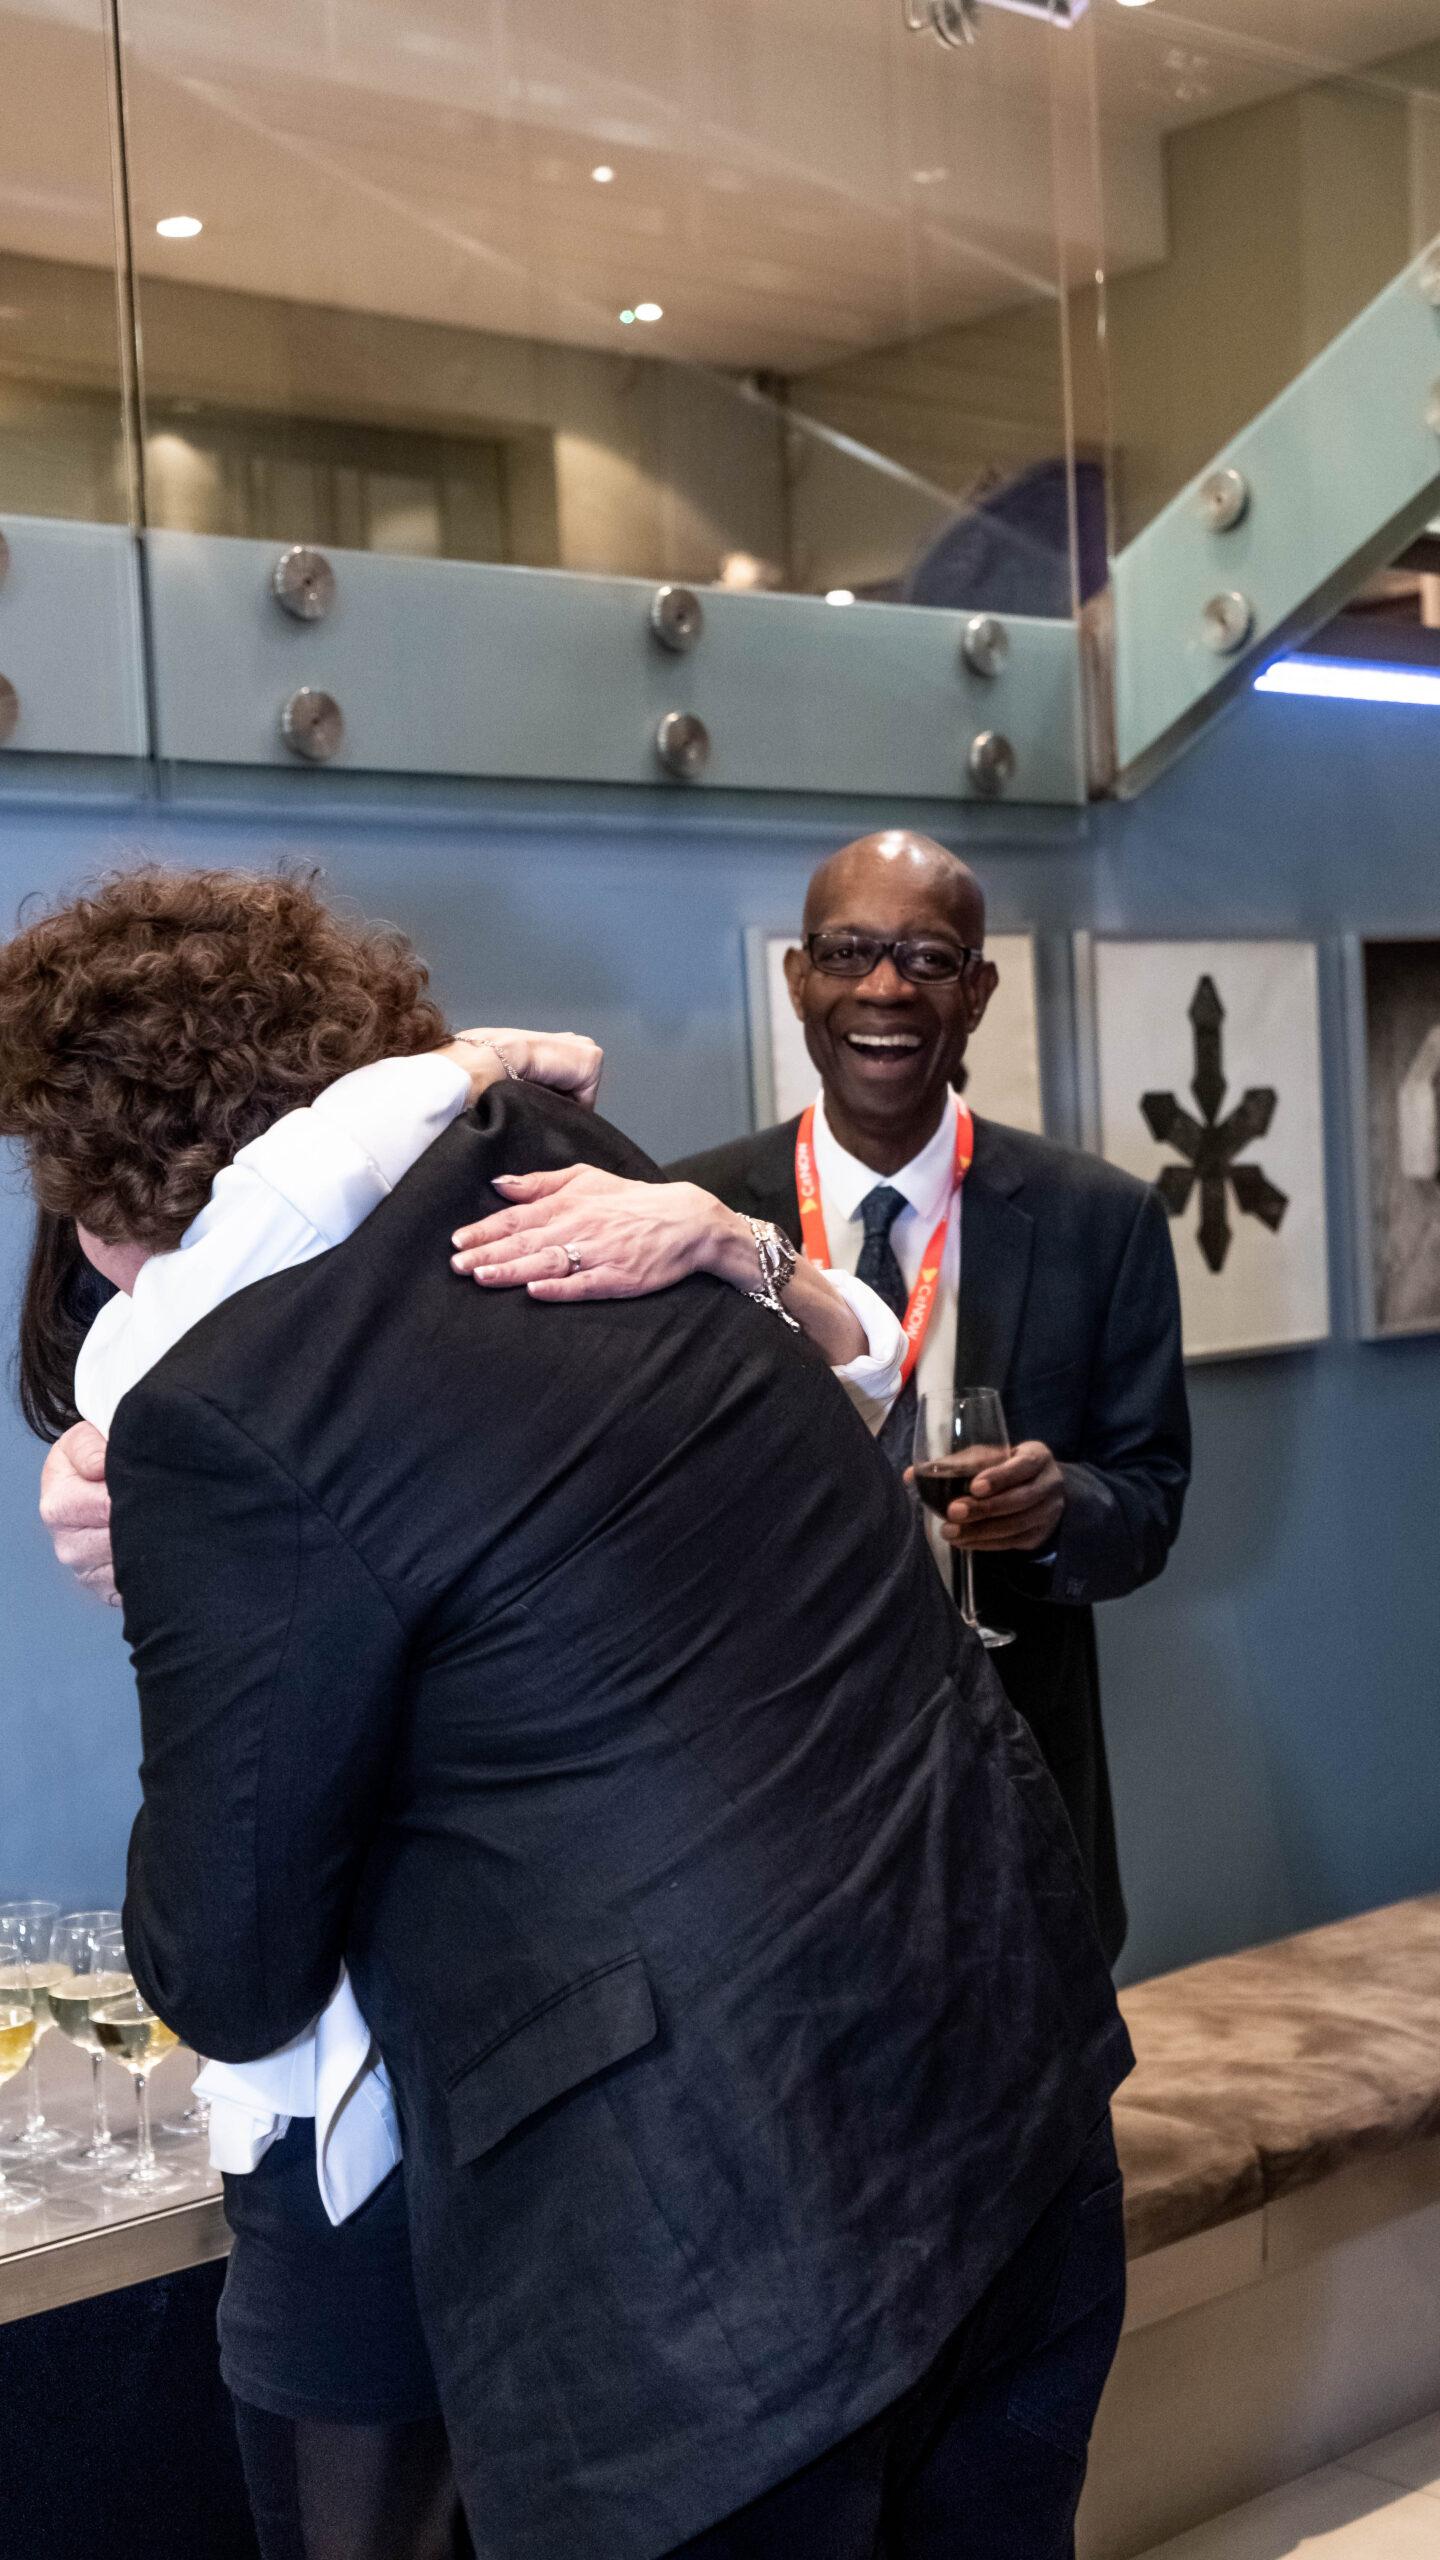 Georfer hugging a woman